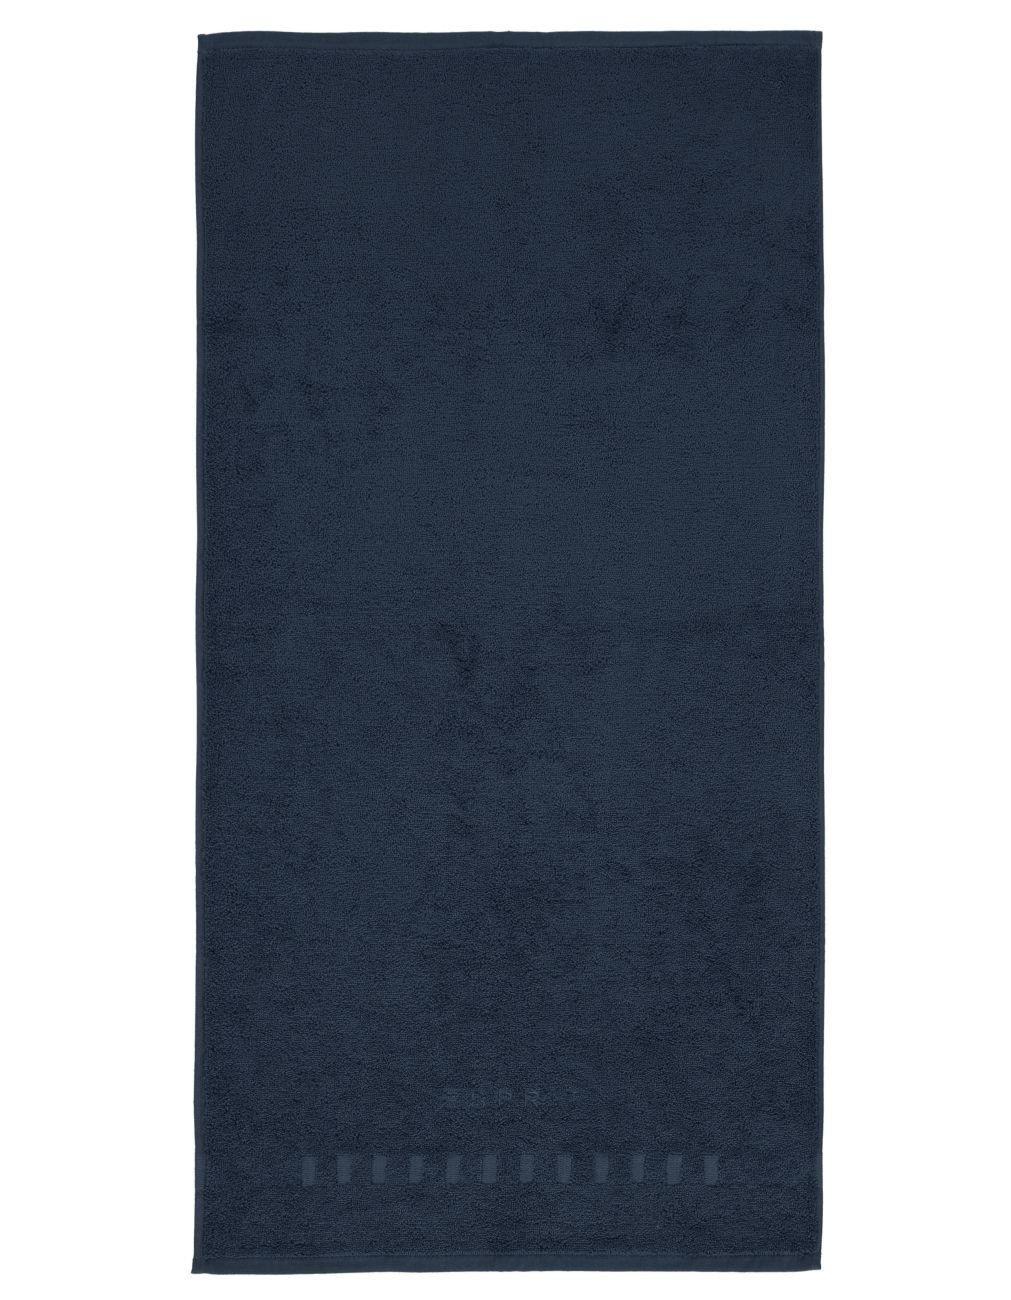 ESPRIT Uni Handtücher Solid Black Waschhandschuh 16x21 cm